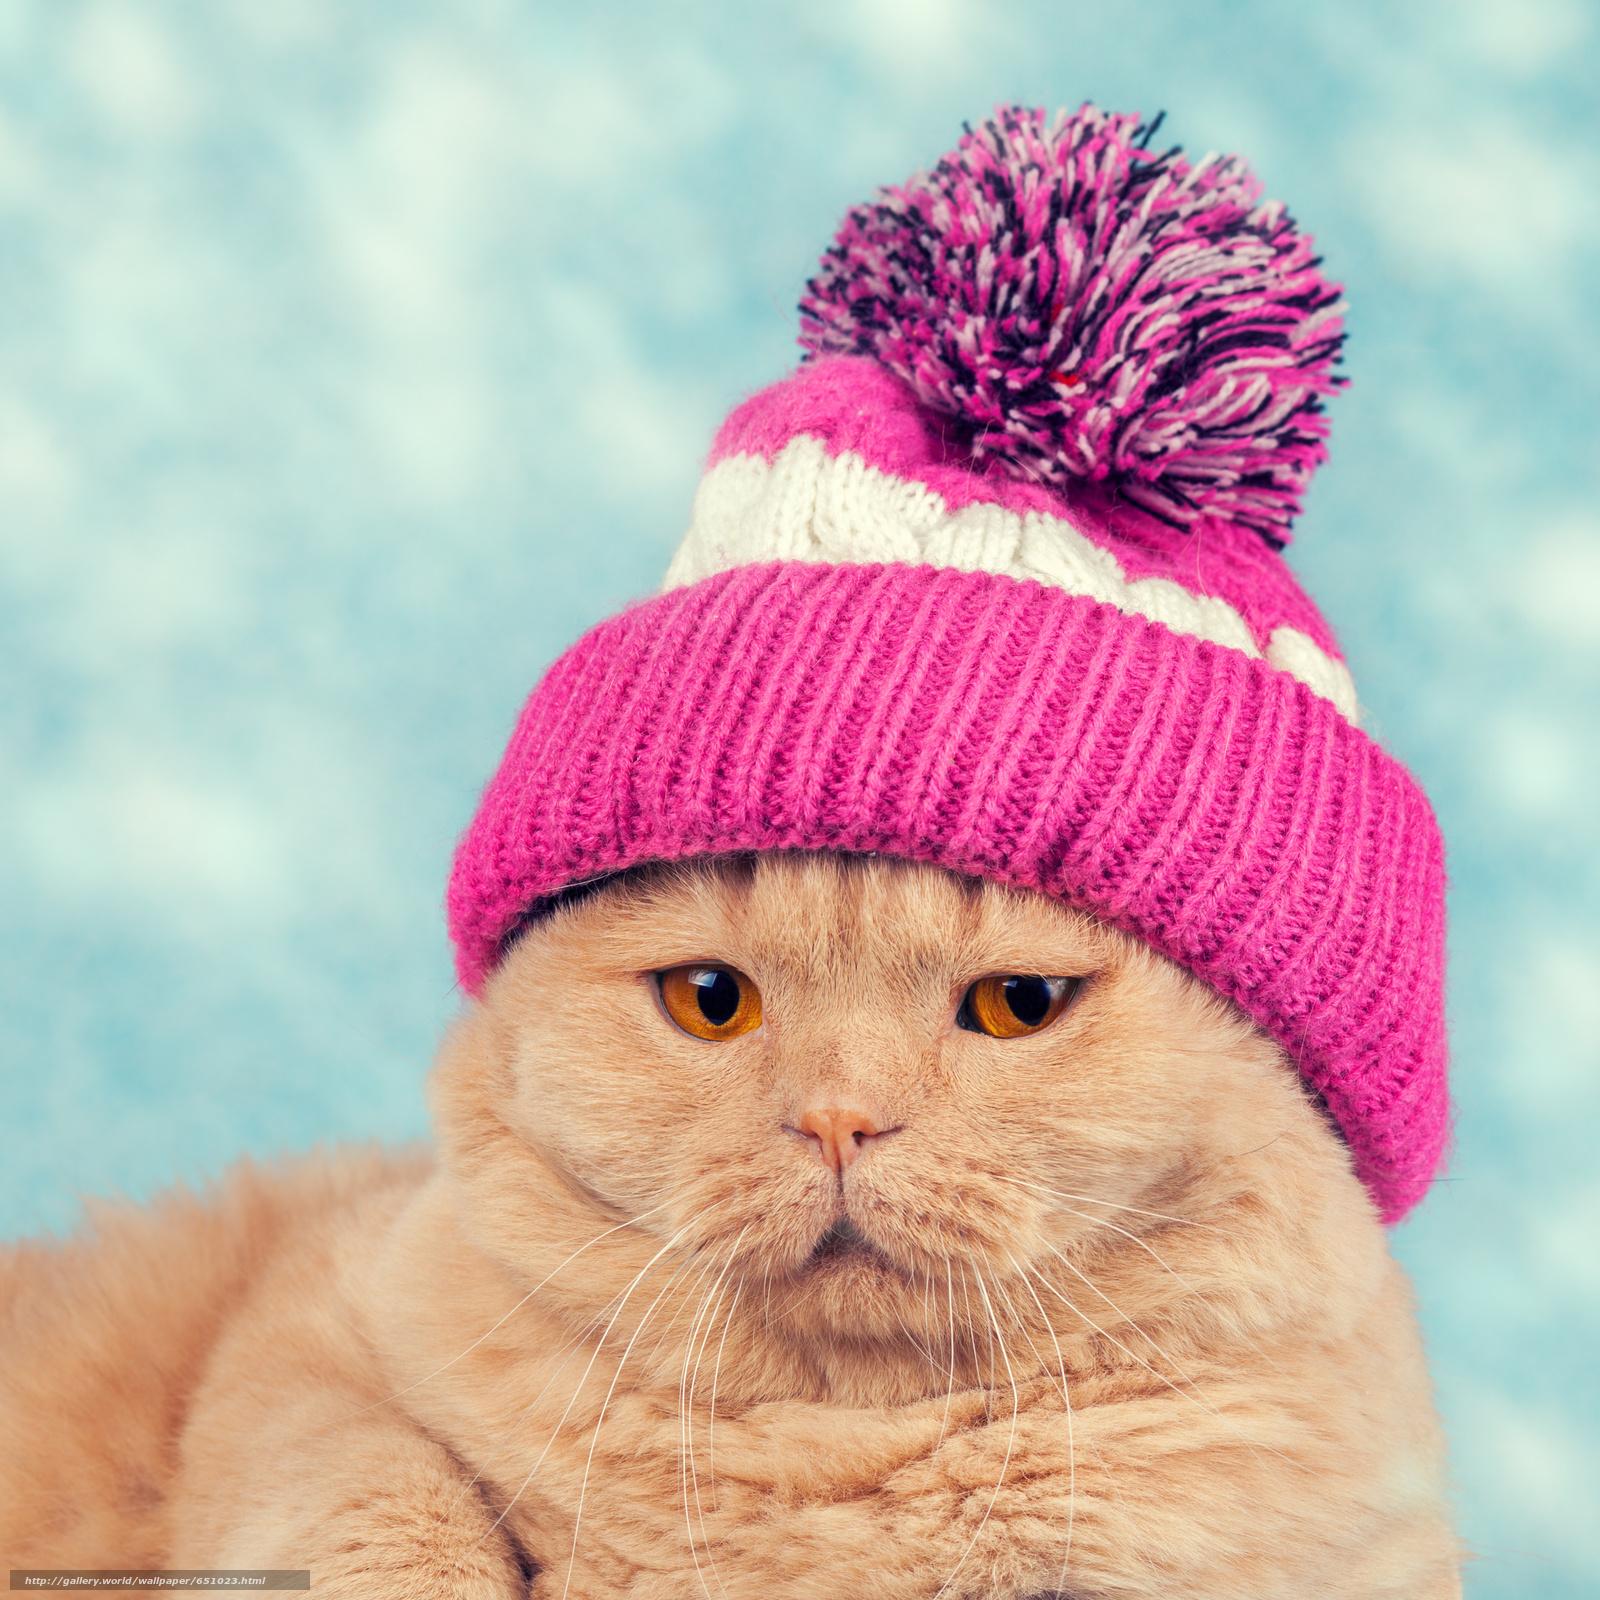 Download wallpaper COTE,  cat,  Cap free desktop wallpaper in the resolution 3156x3156 — picture №651023